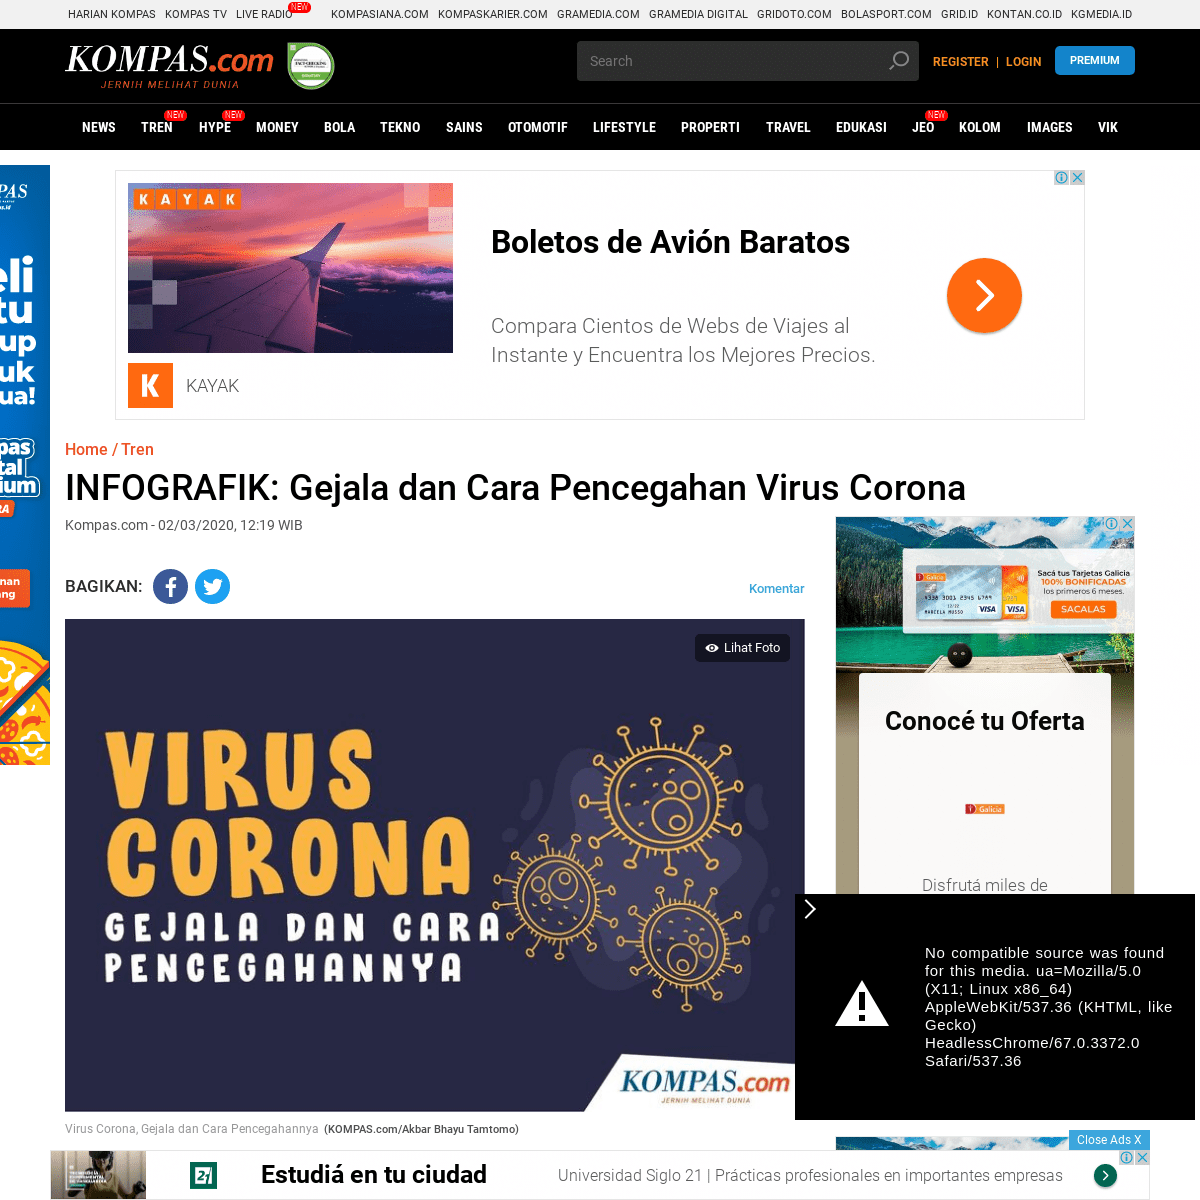 INFOGRAFIK- Gejala dan Cara Pencegahan Virus Corona